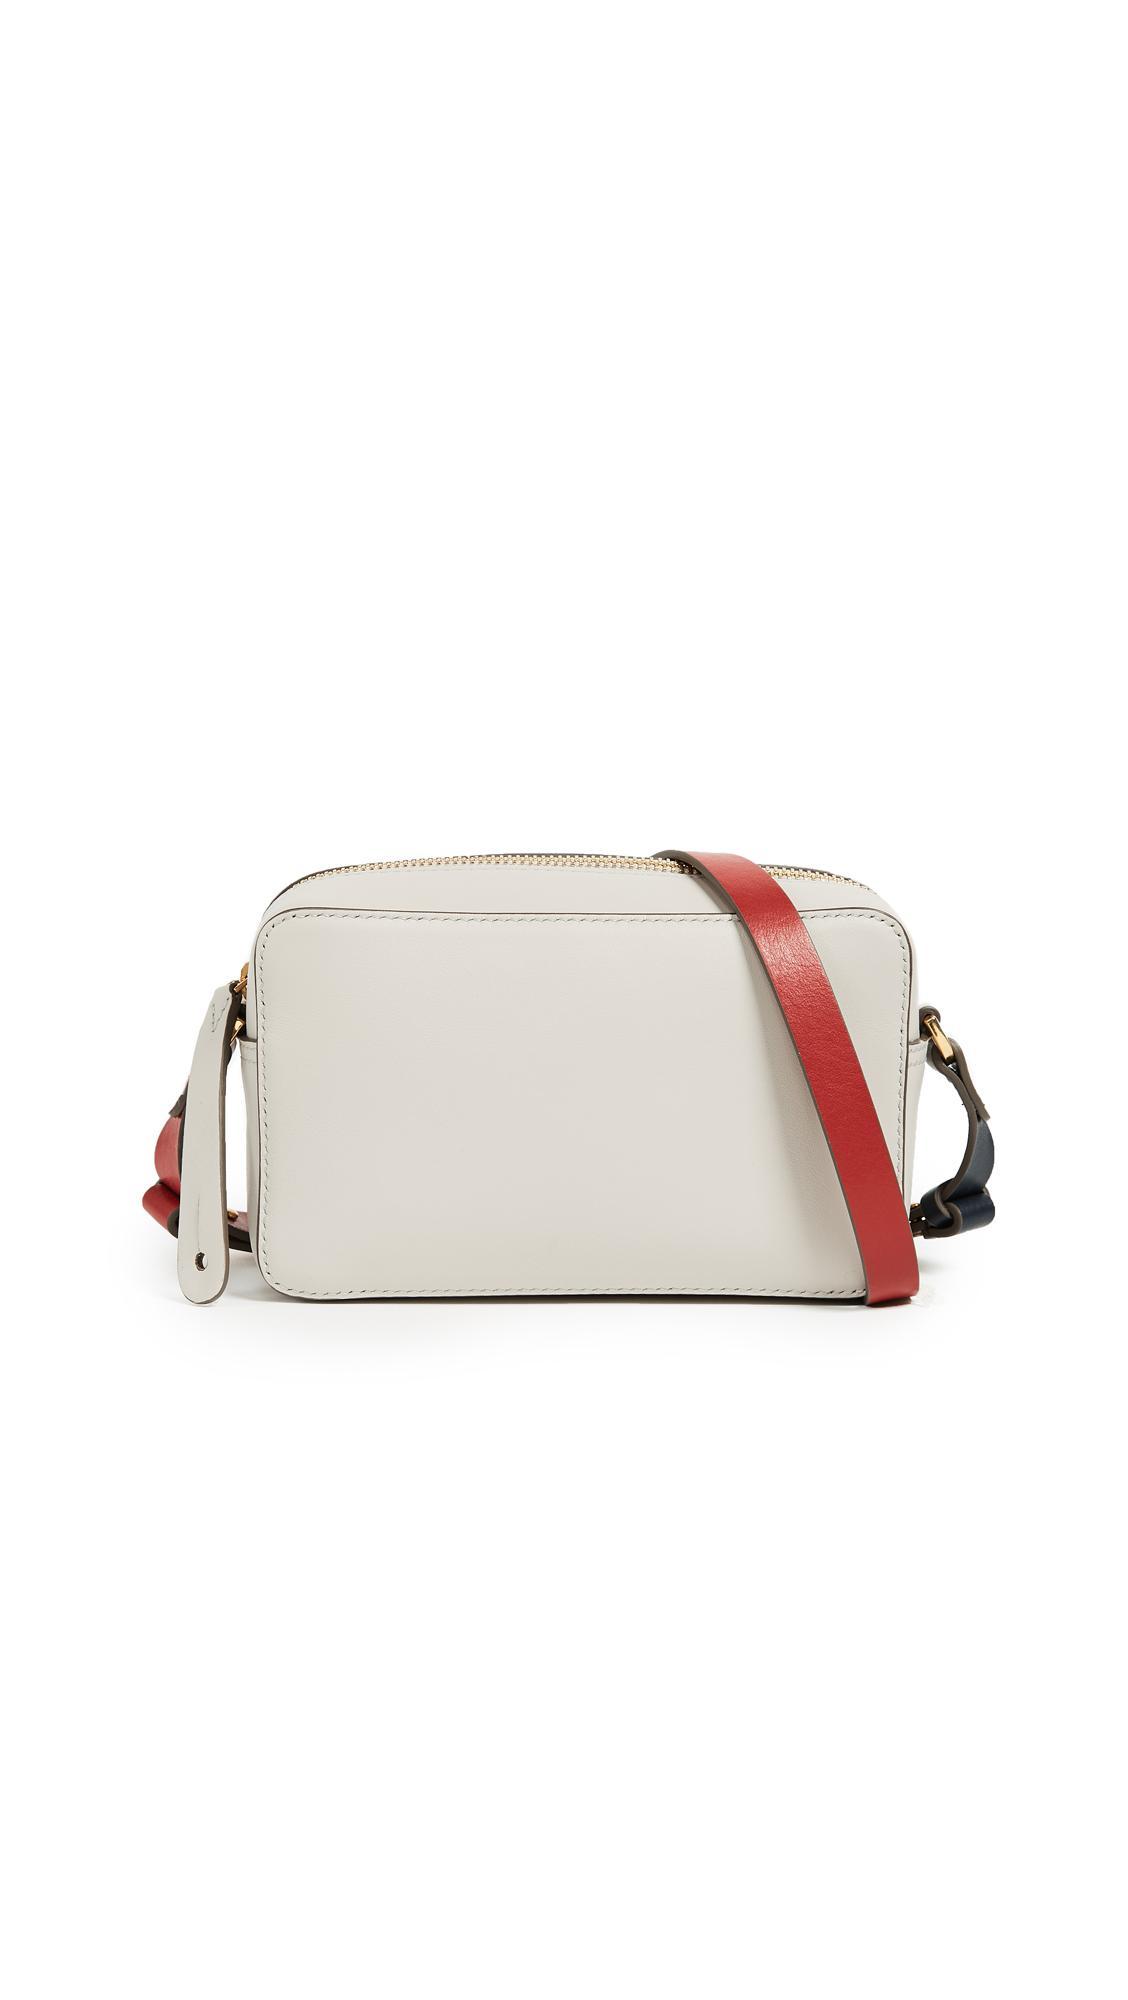 Anya Hindmarch Leather Mini Circle Cross Body Bag